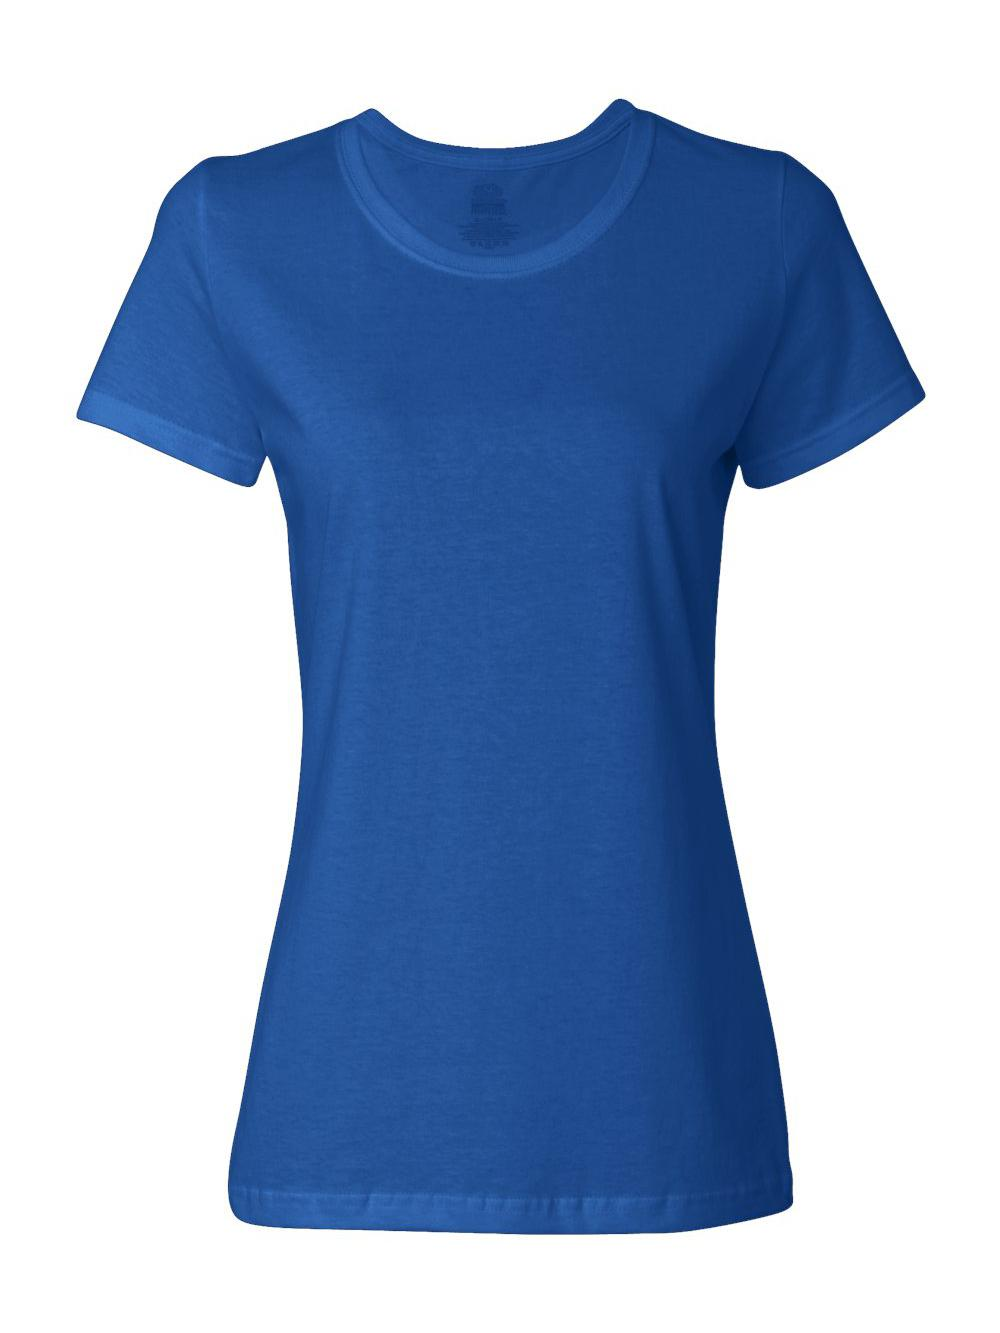 Fruit-of-the-Loom-HD-Cotton-Women-039-s-Short-Sleeve-T-Shirt-L3930R thumbnail 33